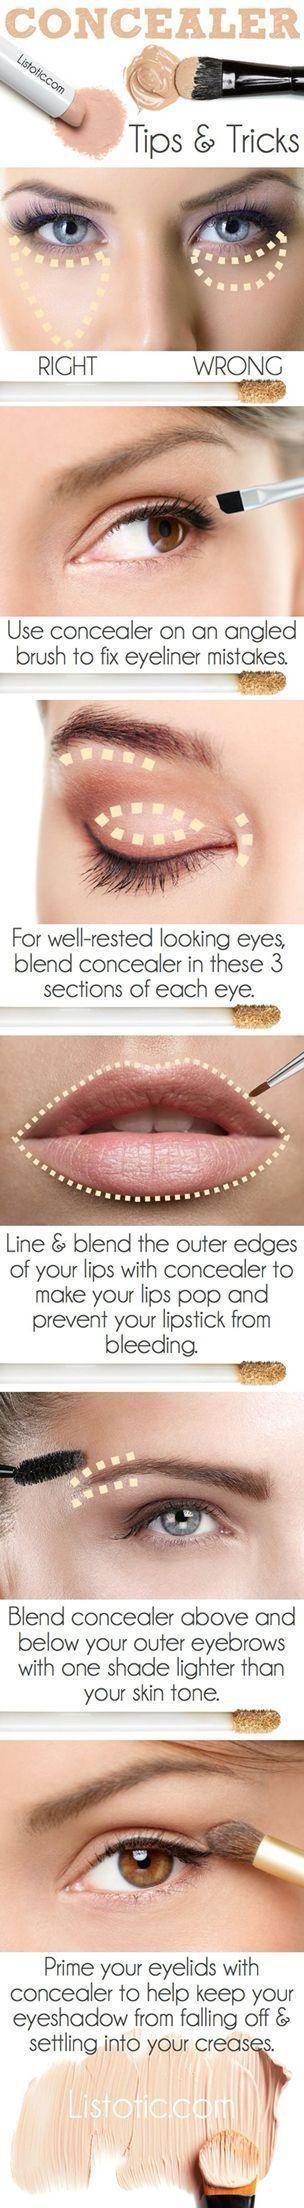 Handy tips for make up!